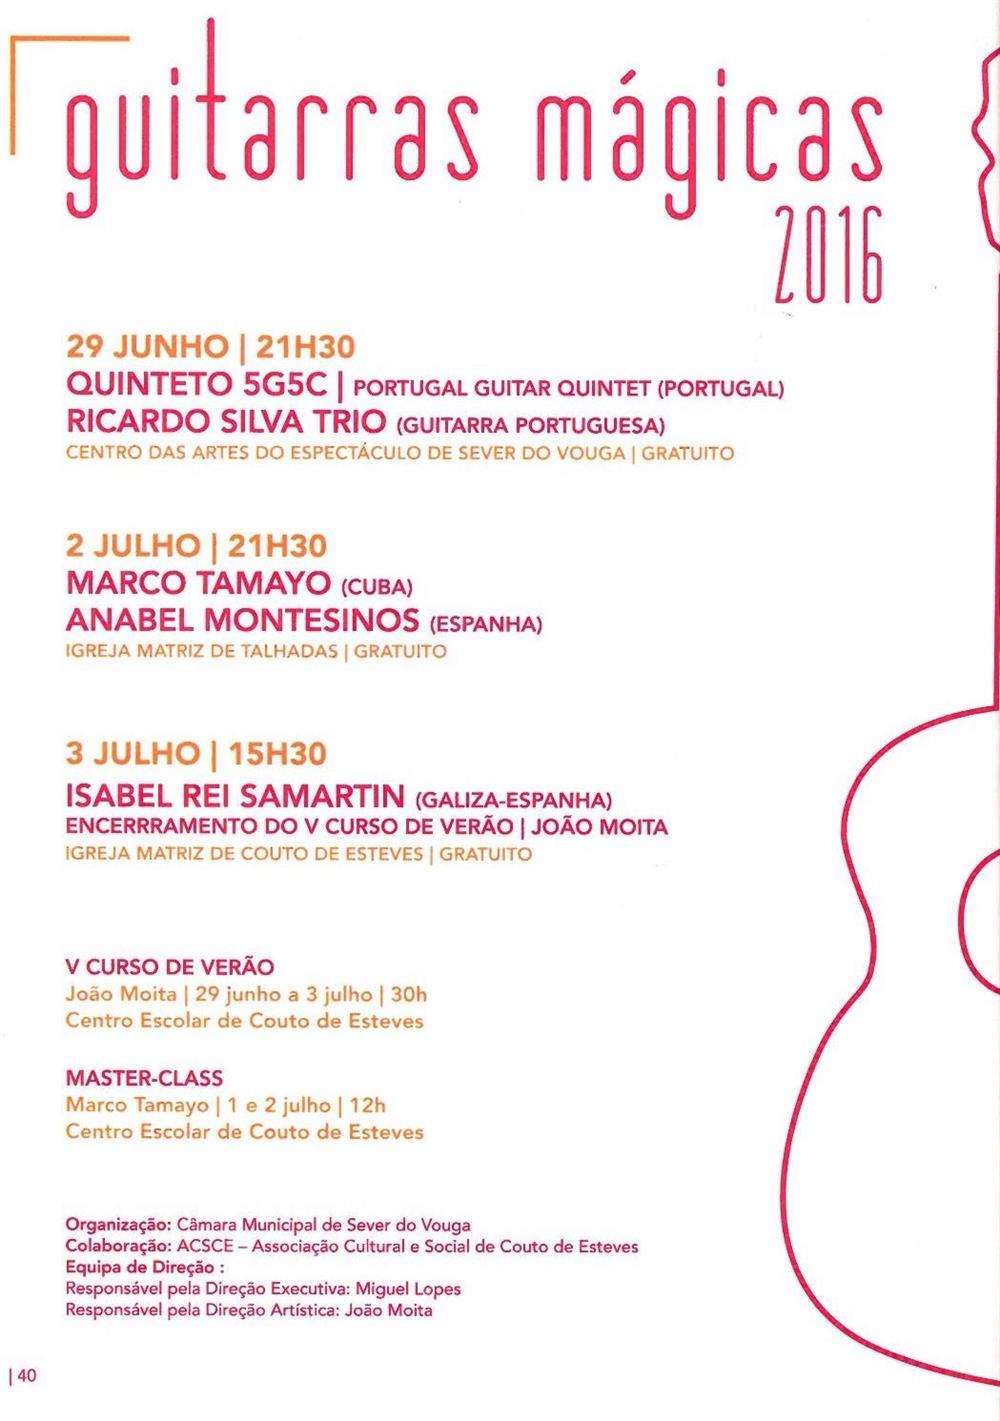 ACMSV-abr.,maio,jun.,jul.'16-p.40-Guitarras Mágicas 2016.jpg